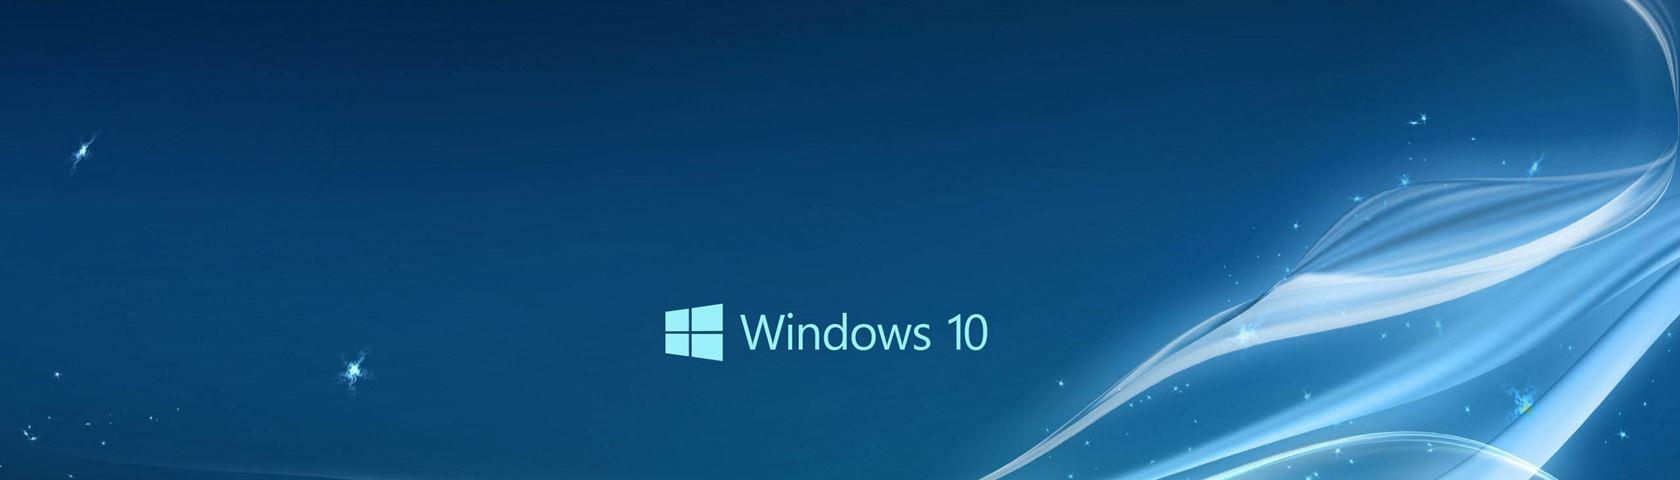 Windows 10 Wave